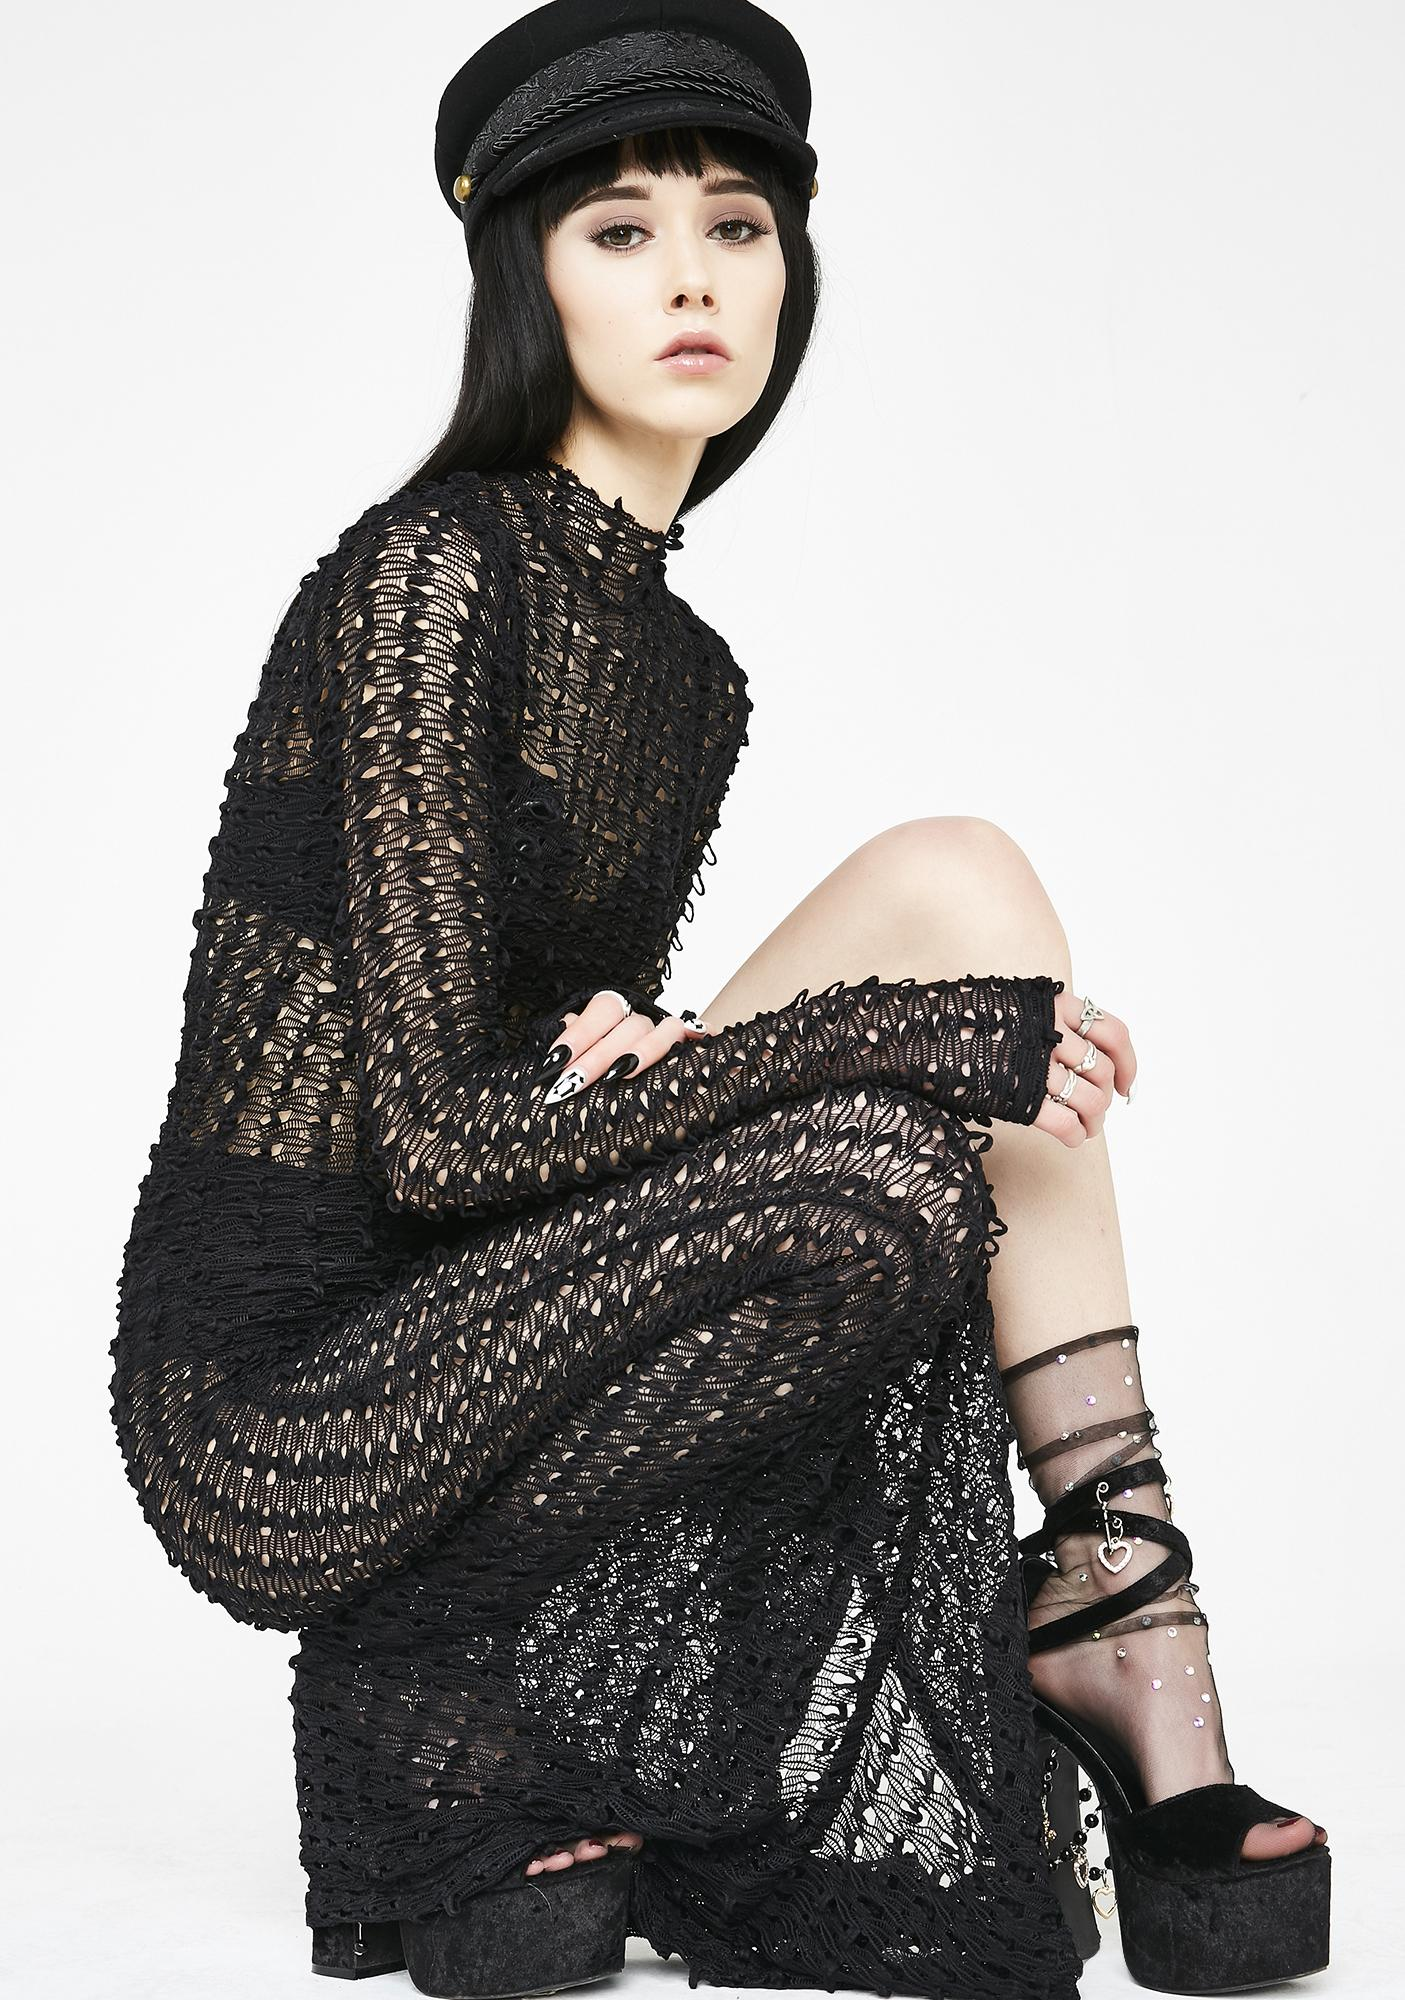 Kiki Riki Darkness Desired Maxi Dress